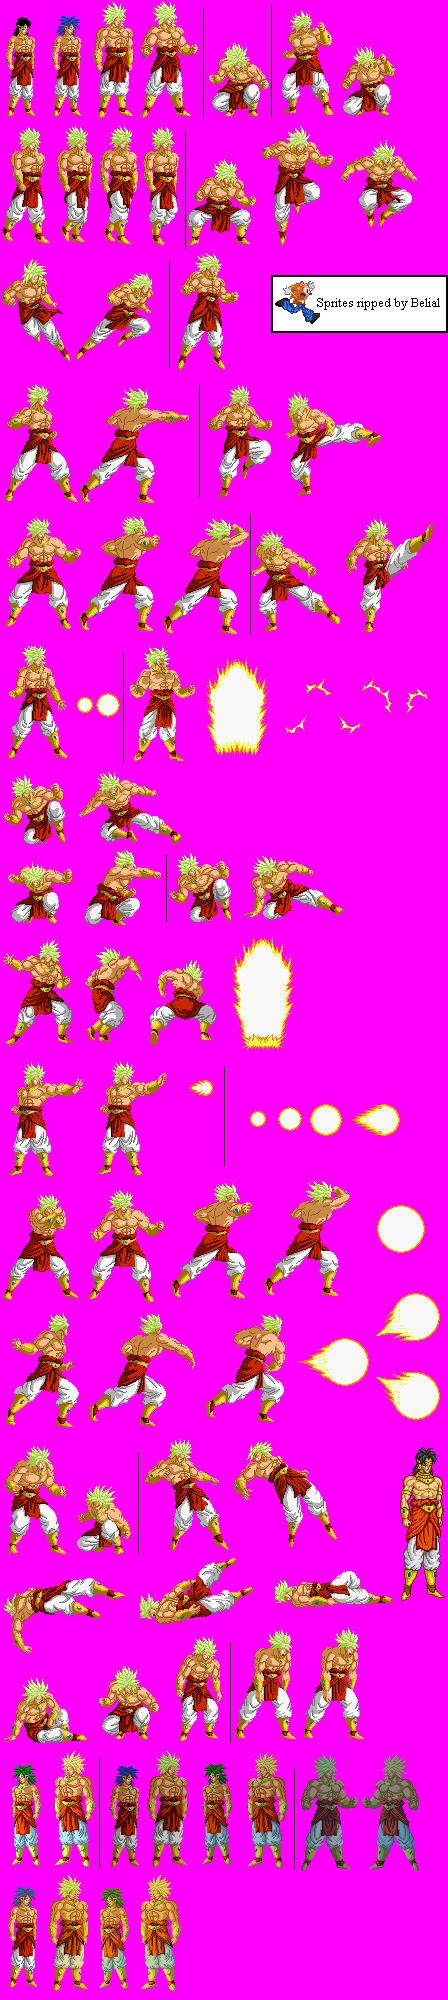 Snes Dragon Ball Z Super Butouden 2 Jpn Broly The Spriters